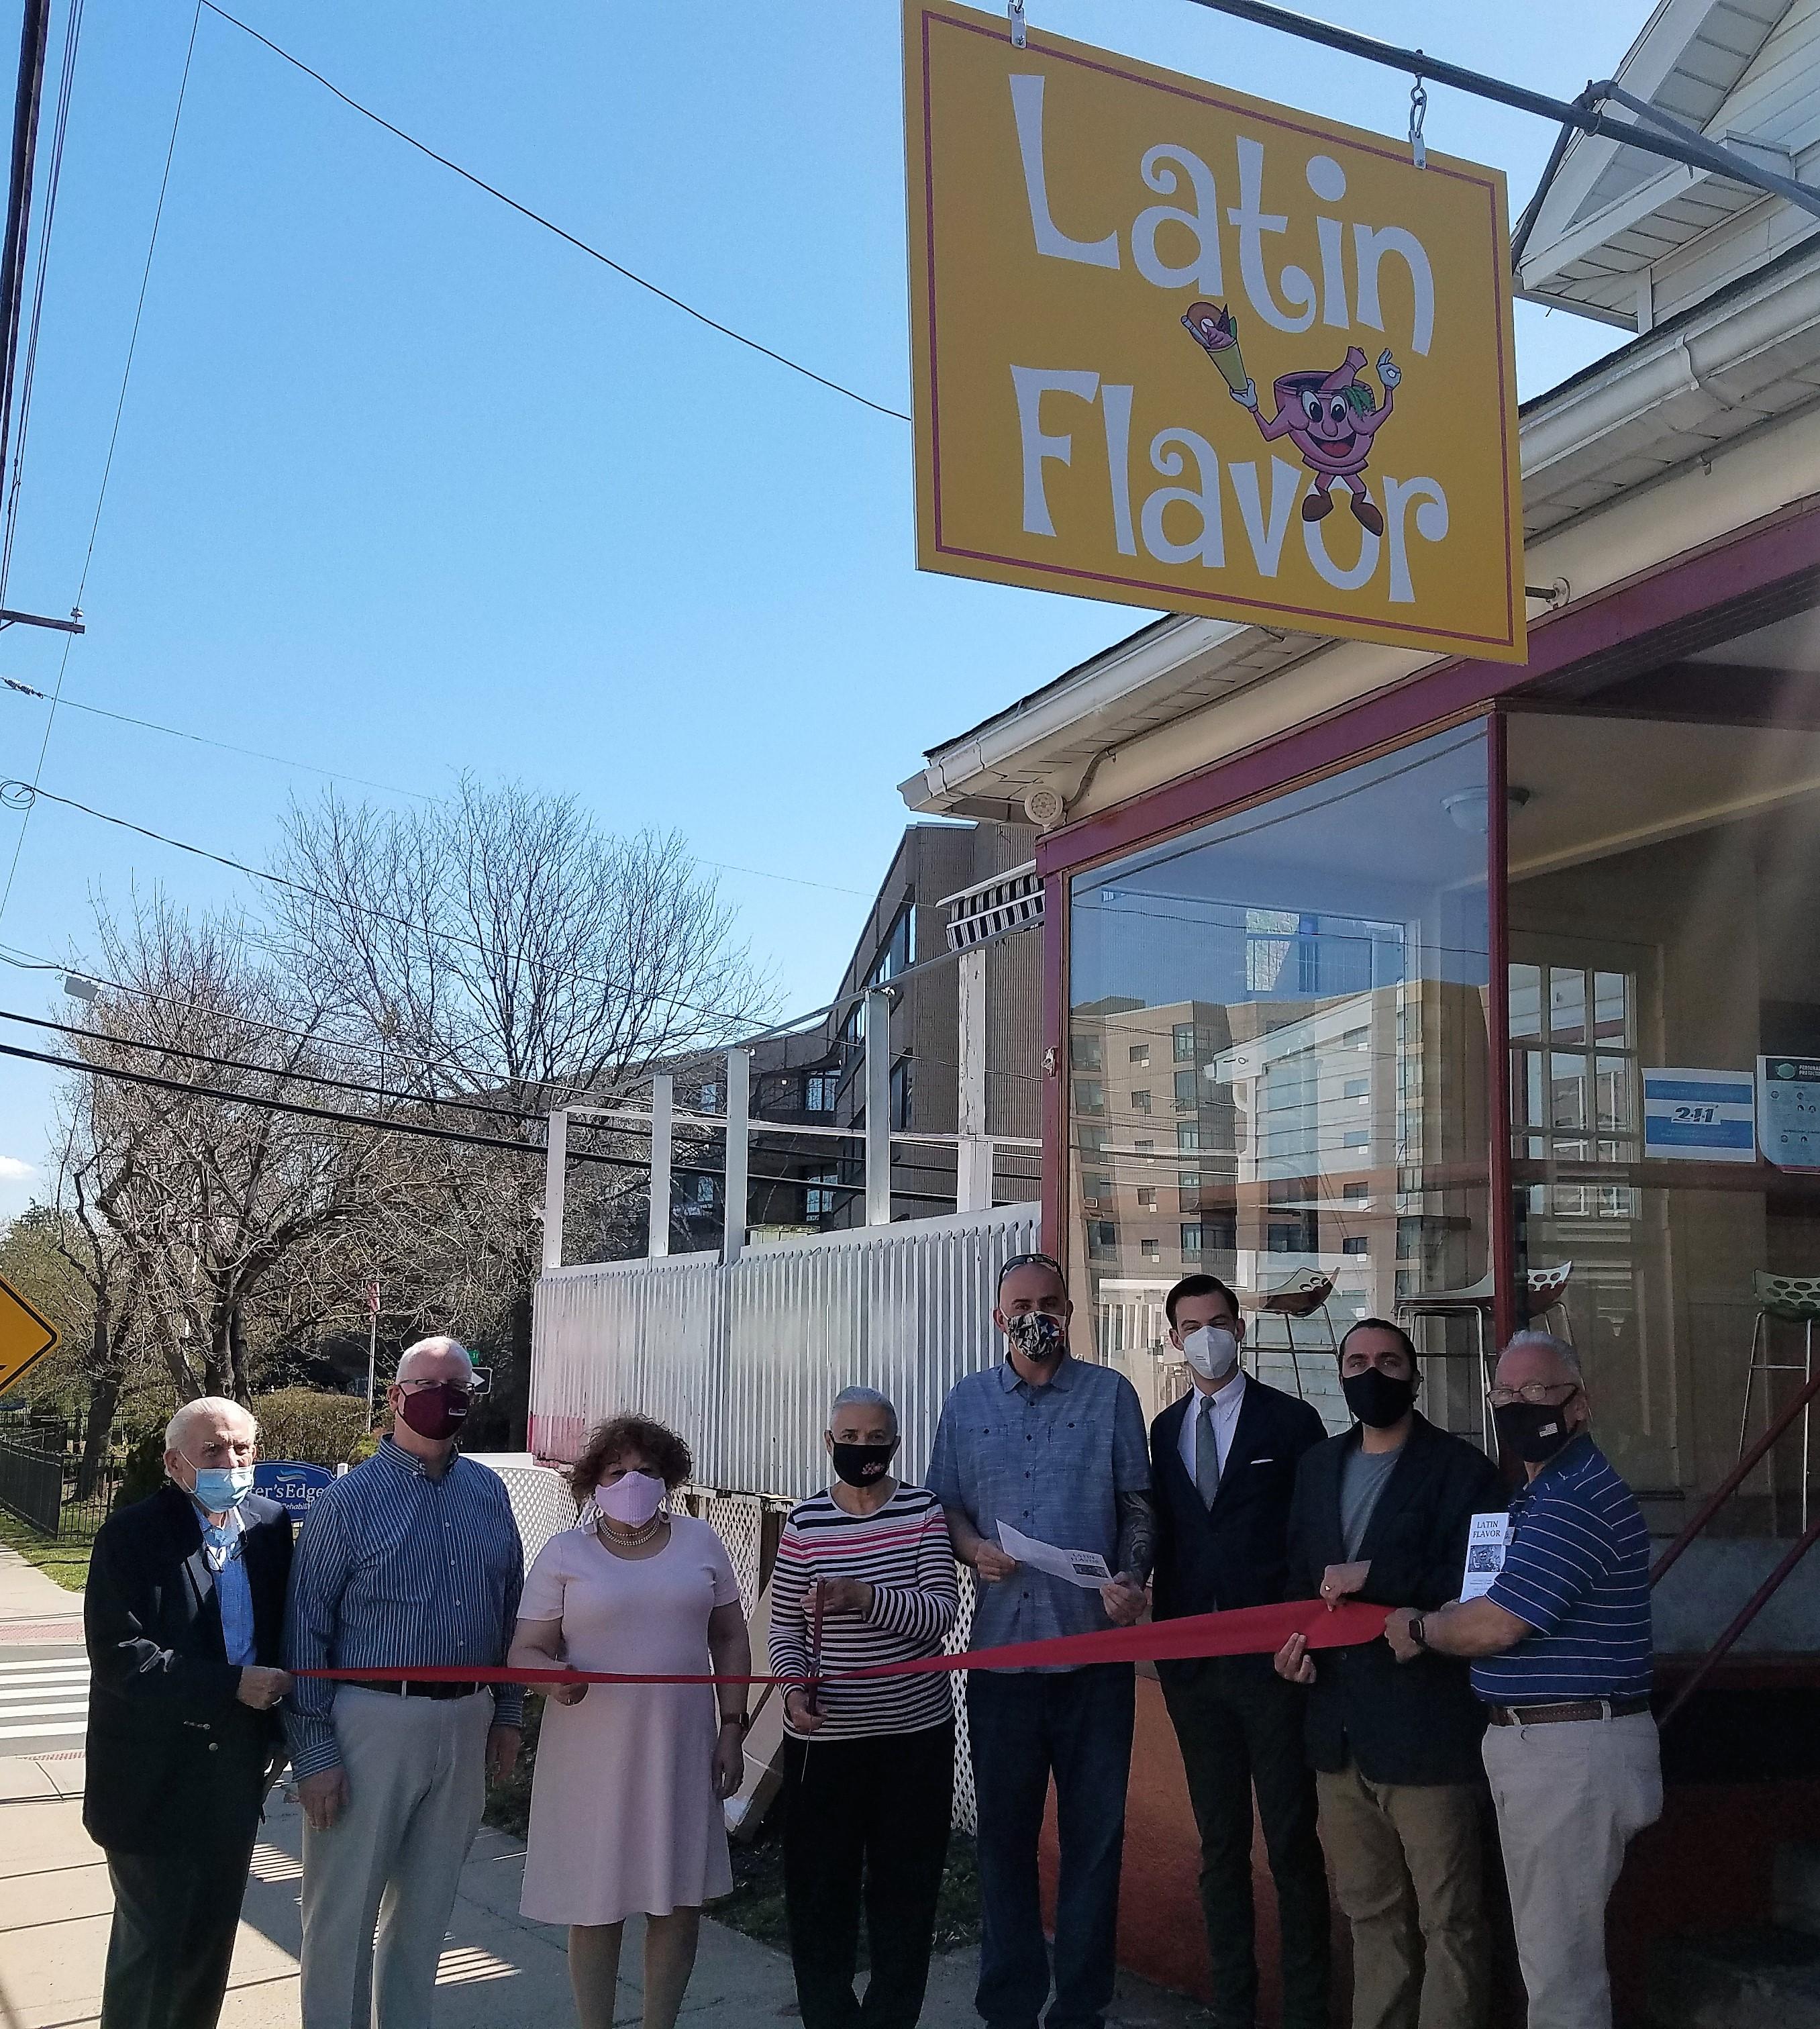 latin flavor 1.5